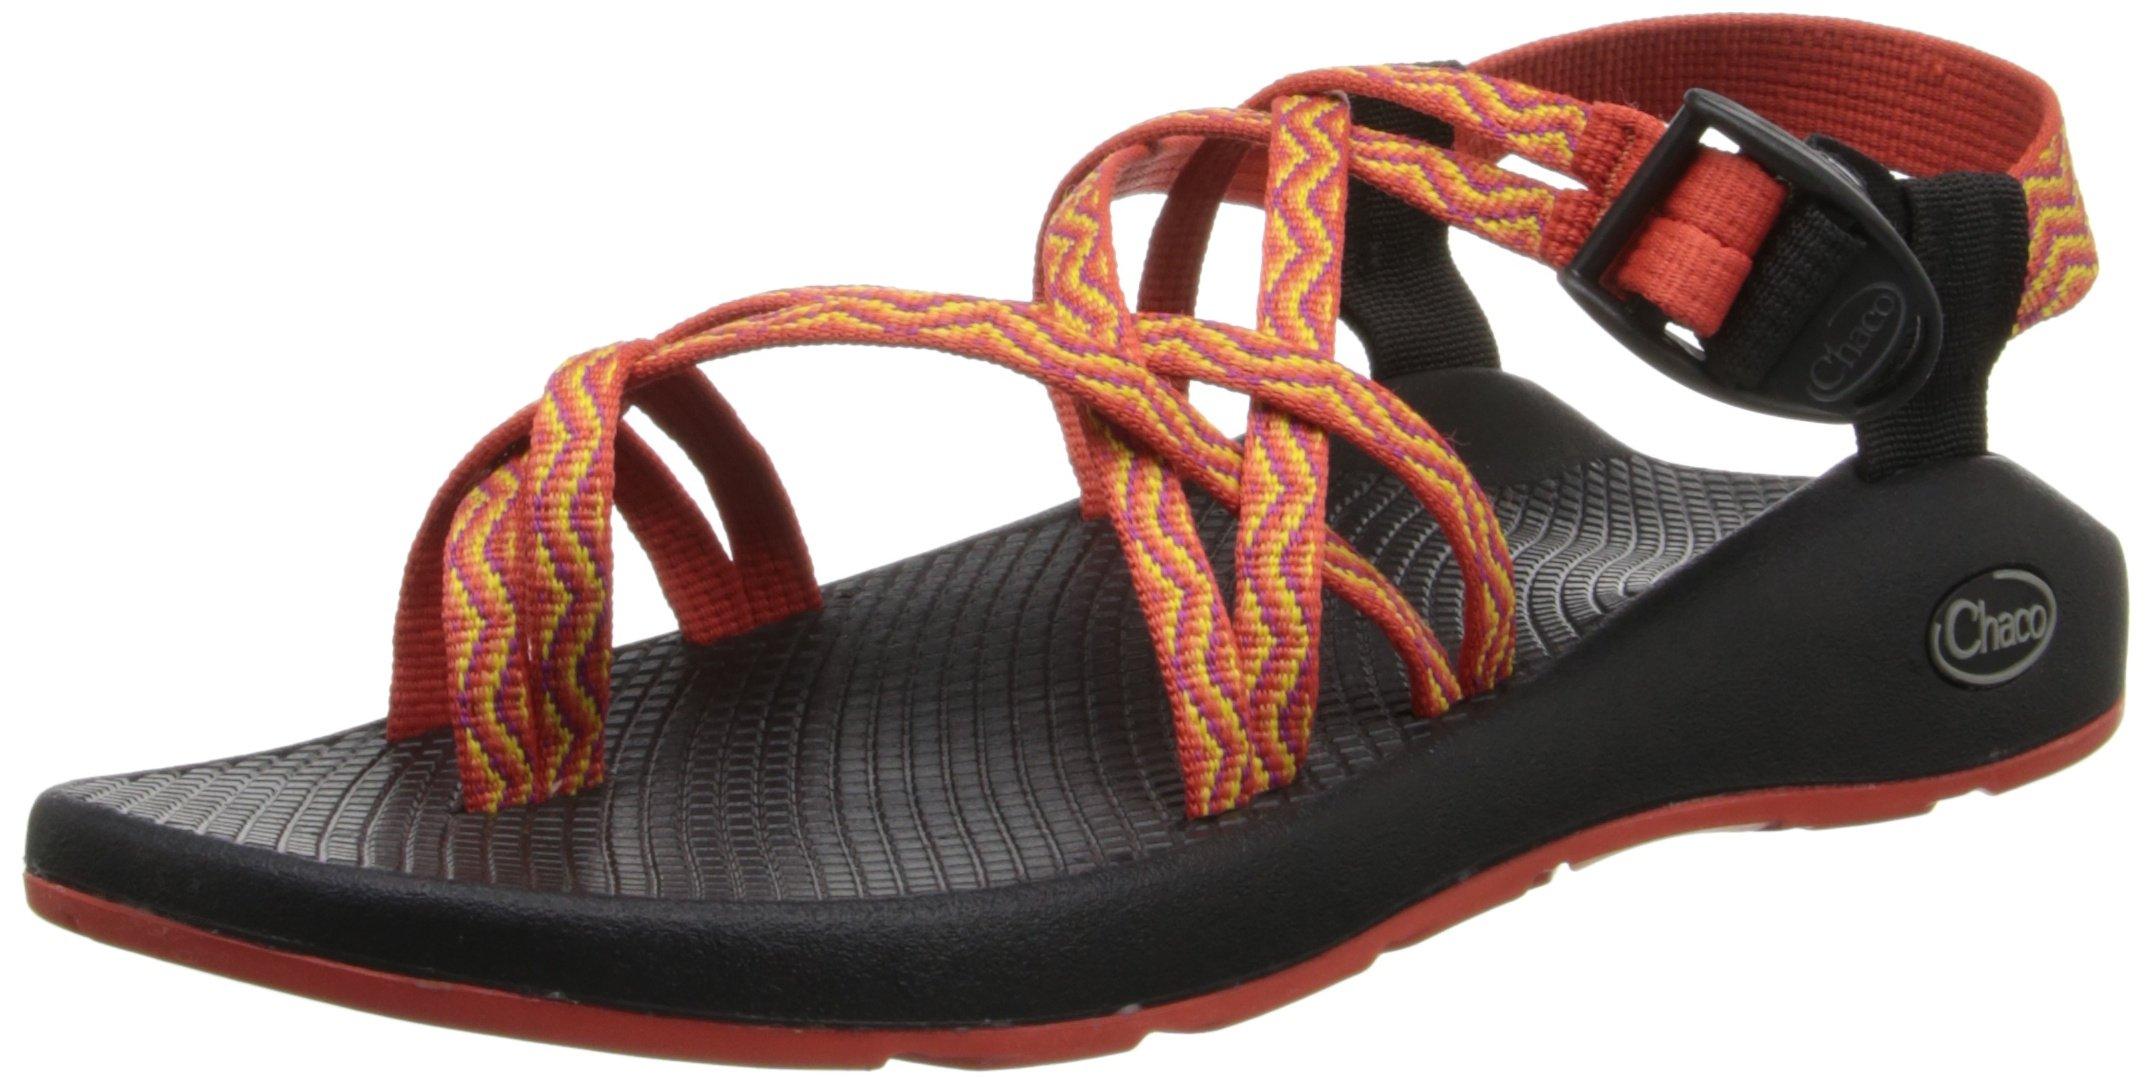 Chaco Women's ZX/2 Yampa Sandal,Rainbow,6 B US